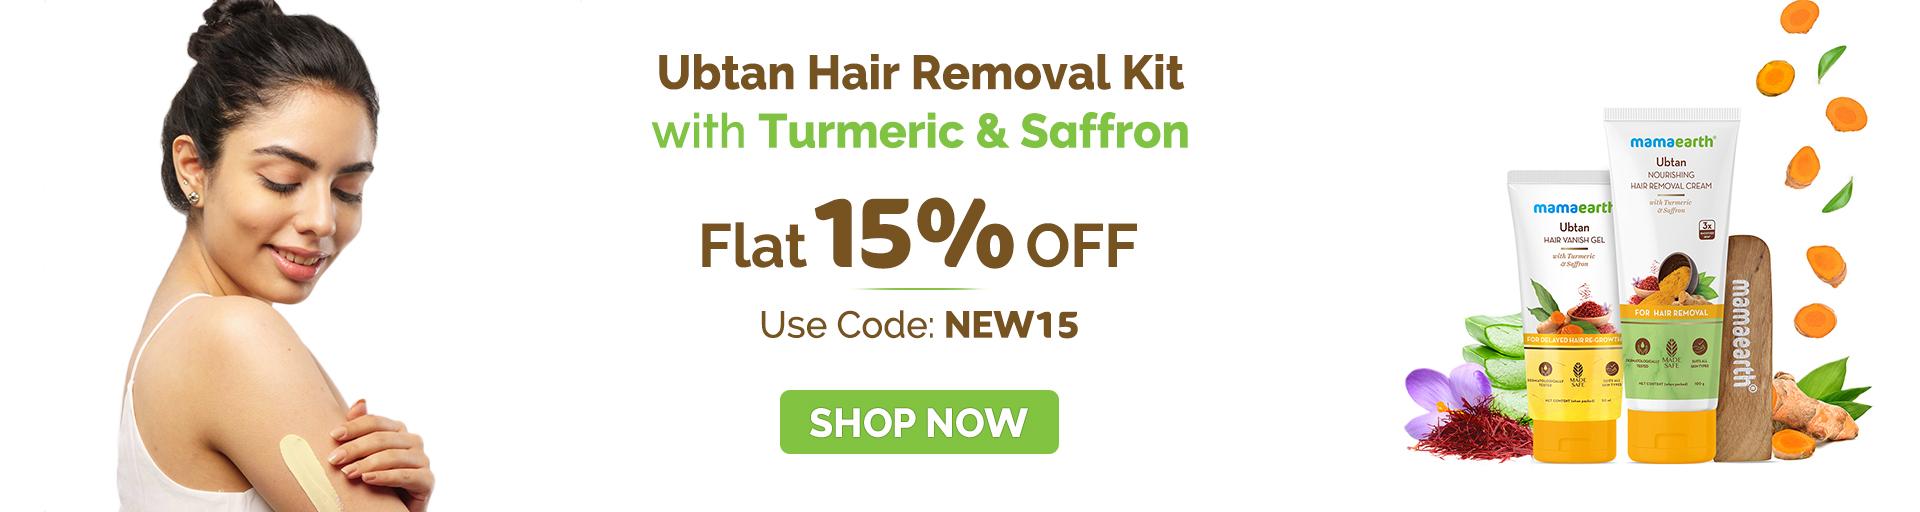 Hair removal kit